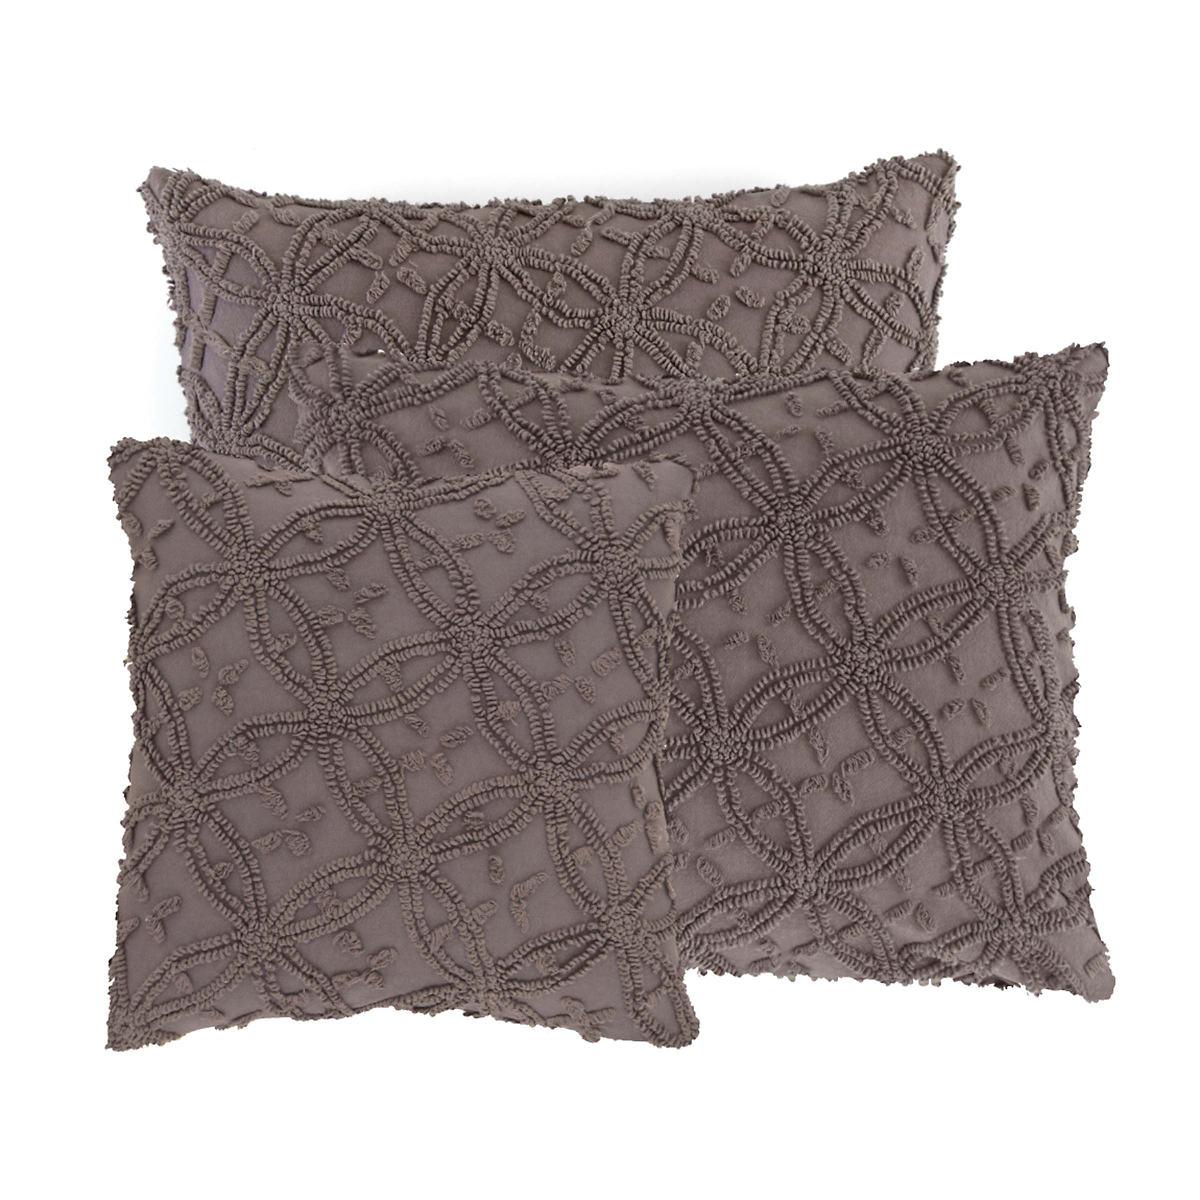 Candlewick Shale Decorative Pillows